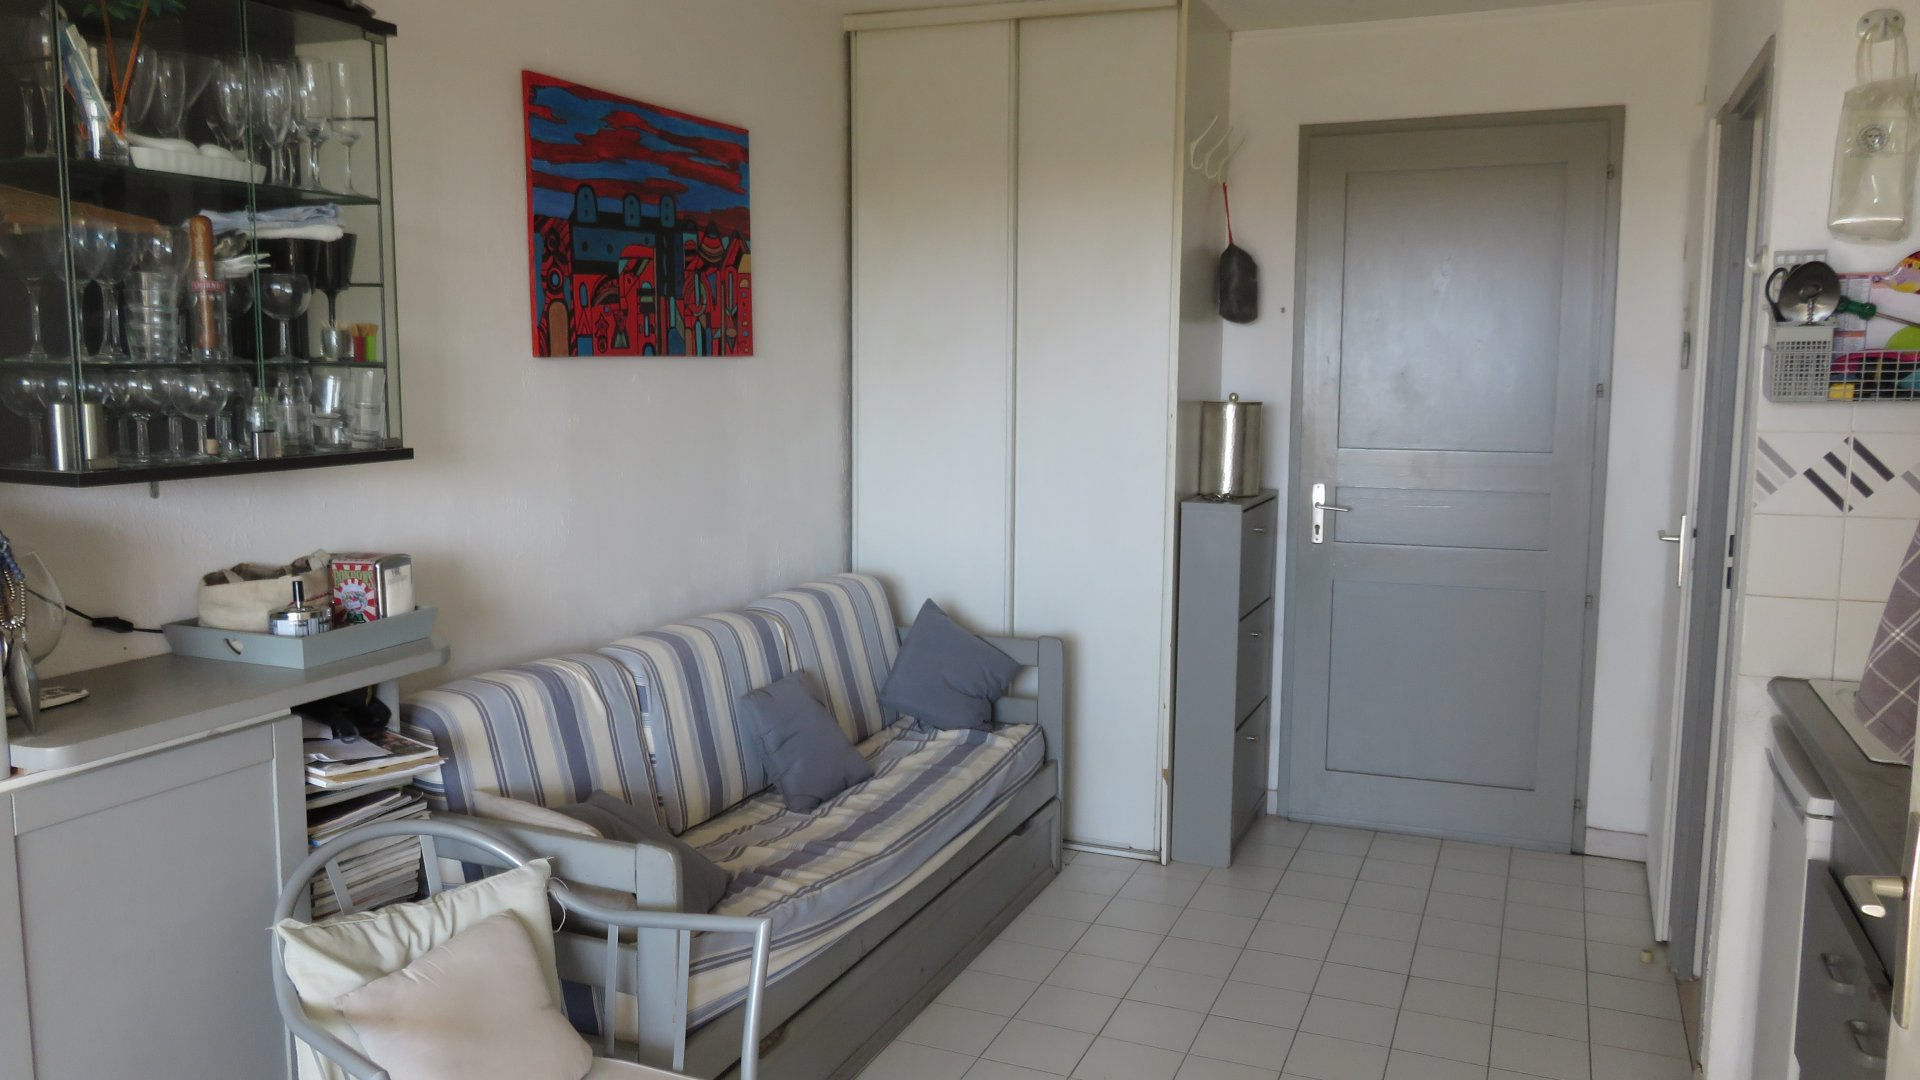 Appartement 2 pièces vue mer et GARAGE